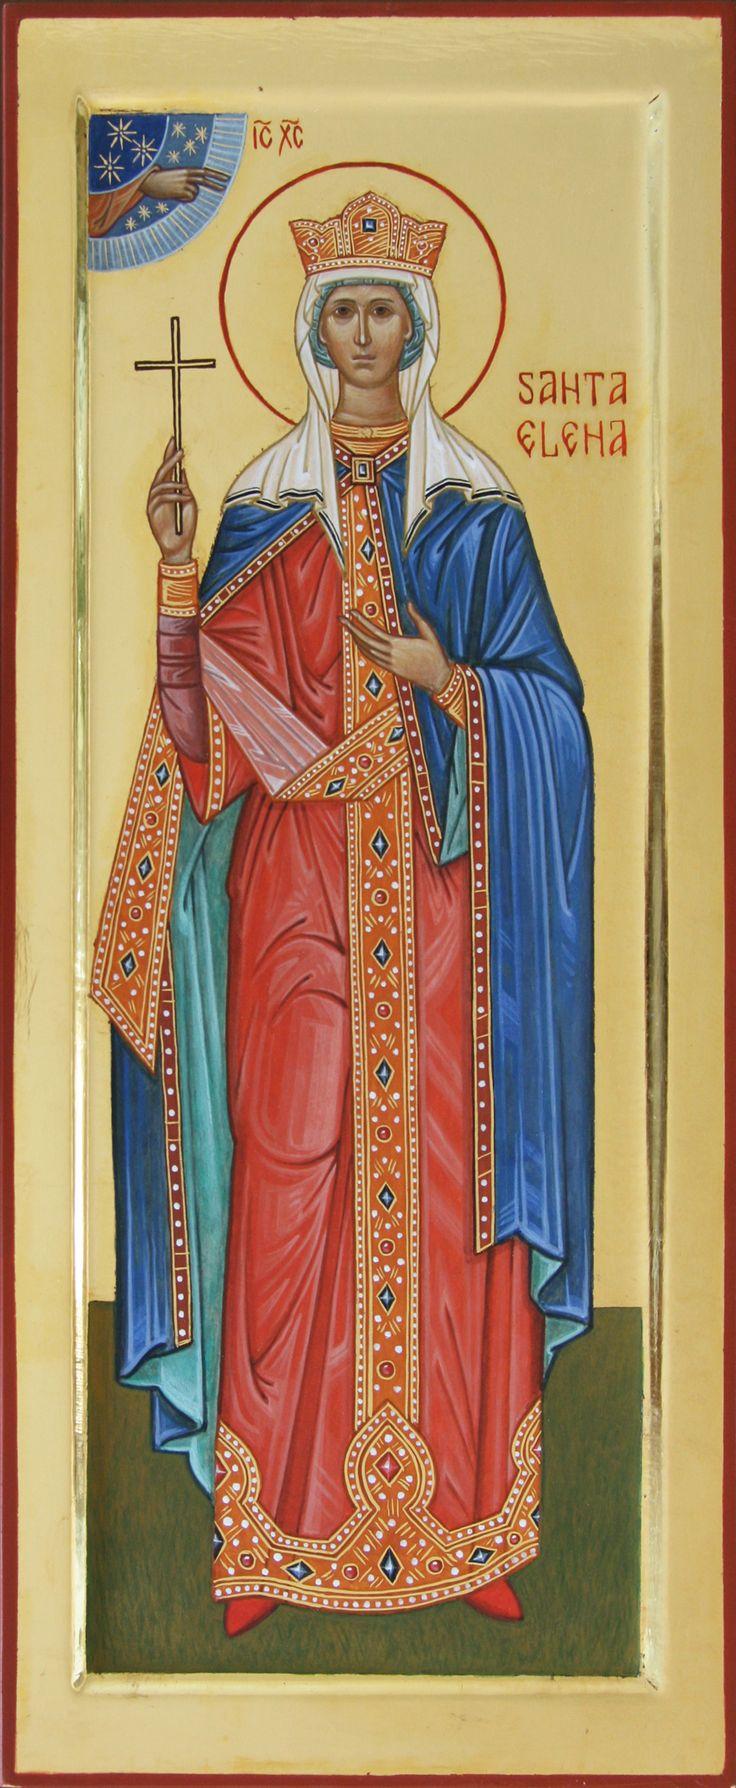 Santa Elena imperatrice icona per mano di Giuliano Melzi (Italy)